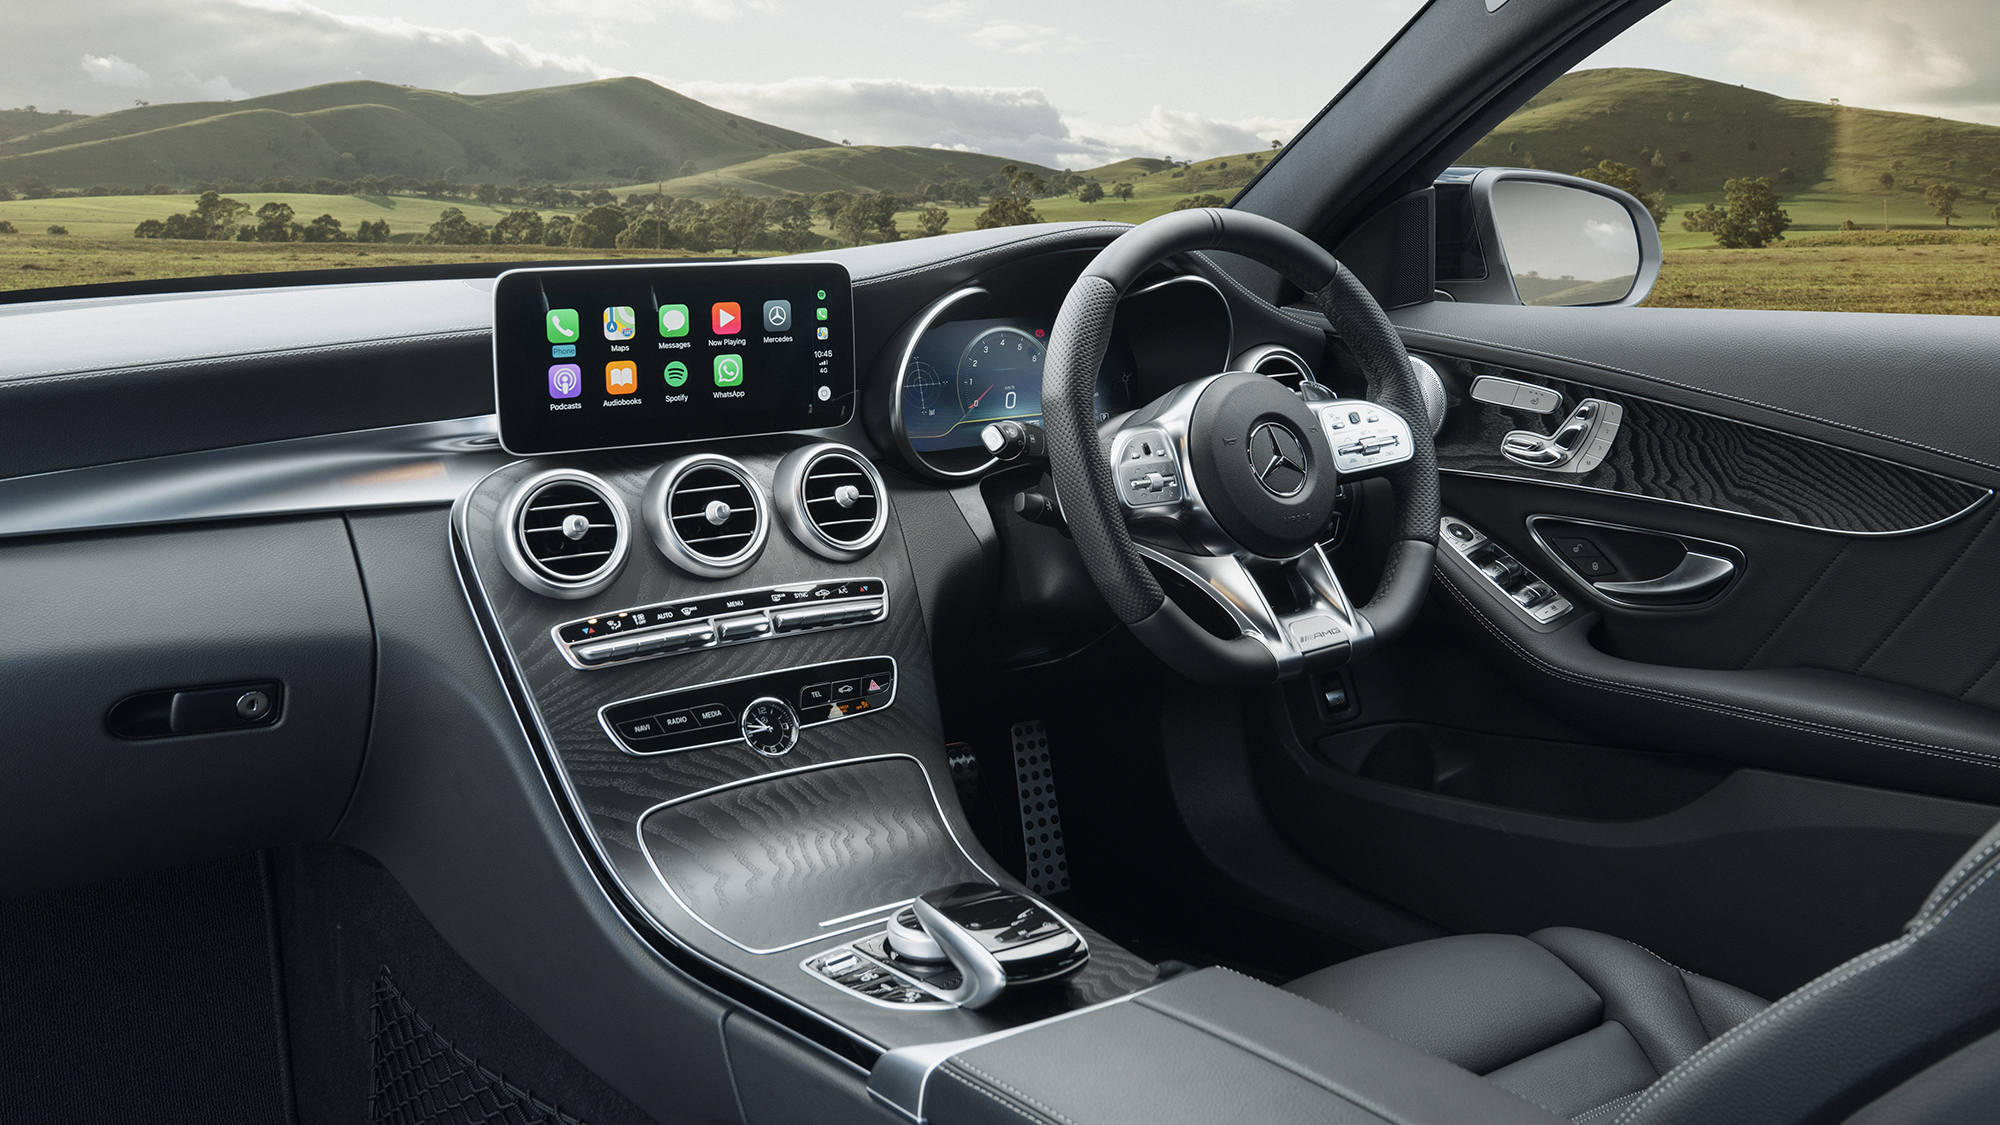 2019 Mercedes-Benz C-Class Sedan/Estate pricing and specs